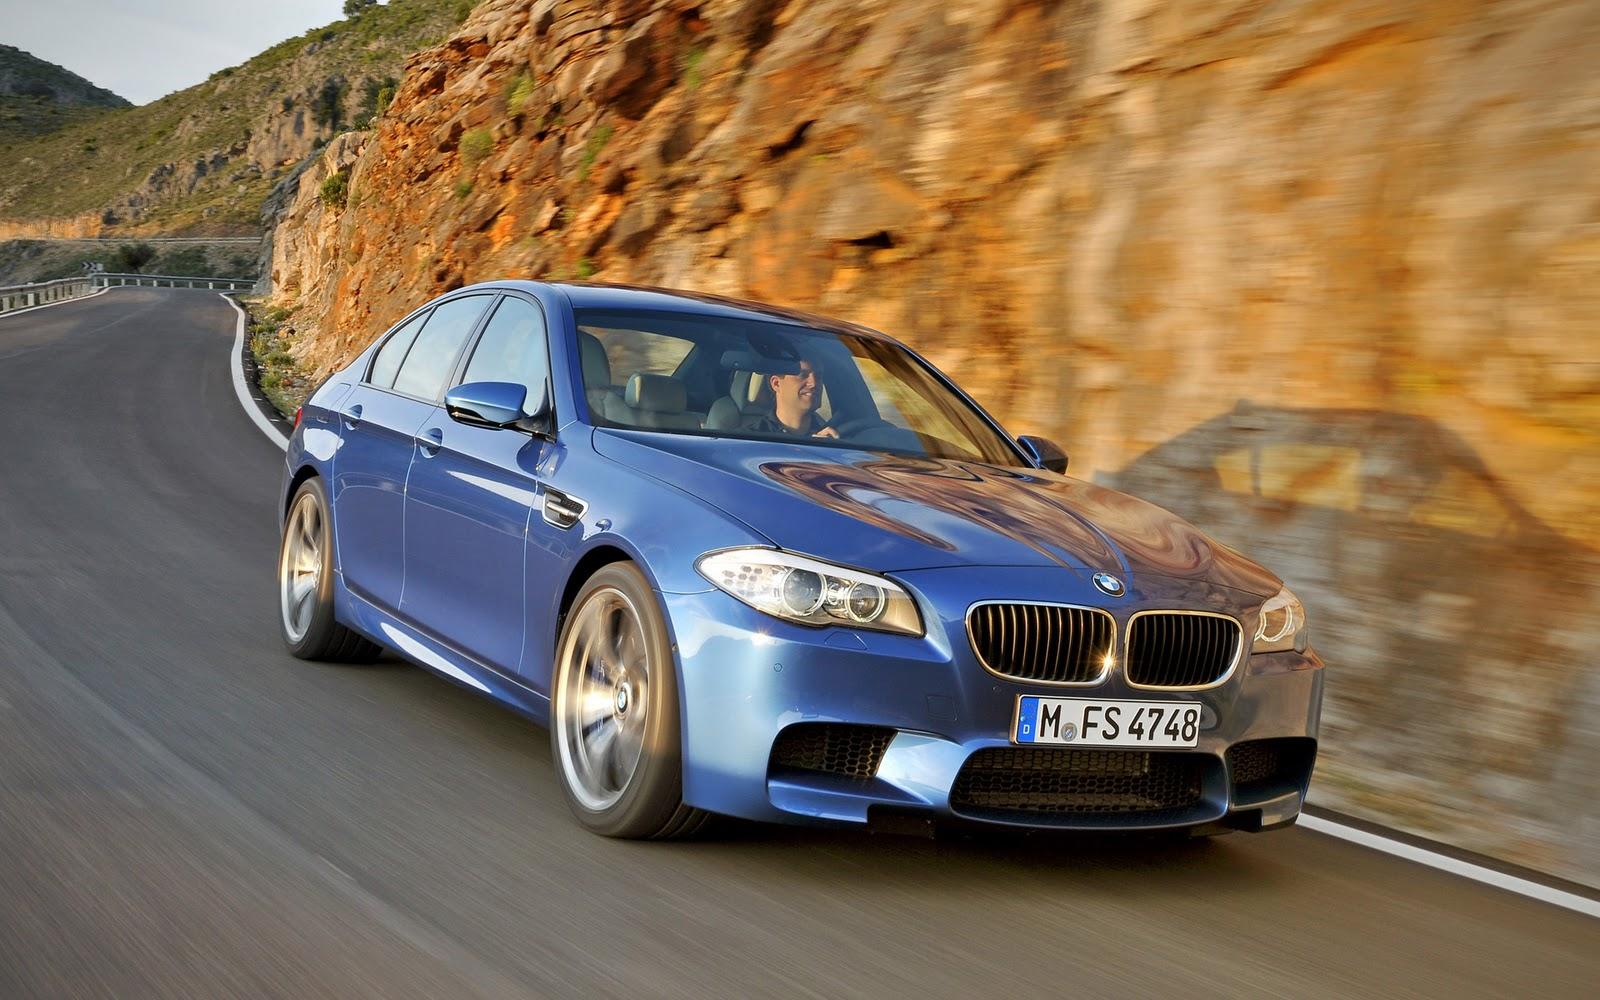 http://4.bp.blogspot.com/-oSpq-NkJ5Zk/TuJUAWmy88I/AAAAAAAABsQ/80008ZtVpK4/s1600/BMW-M5-F10-Blue-Front-View_1920x1200_6884.jpg